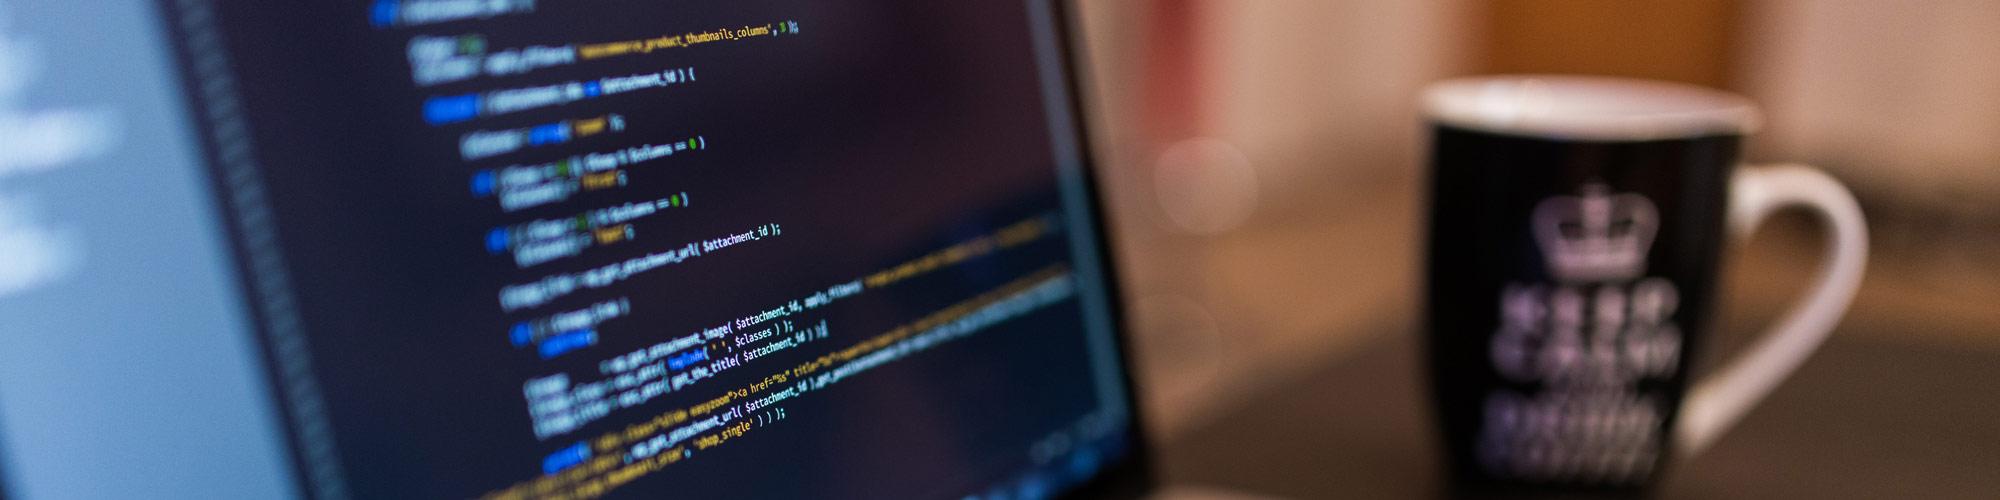 Web Entwickler Jobs